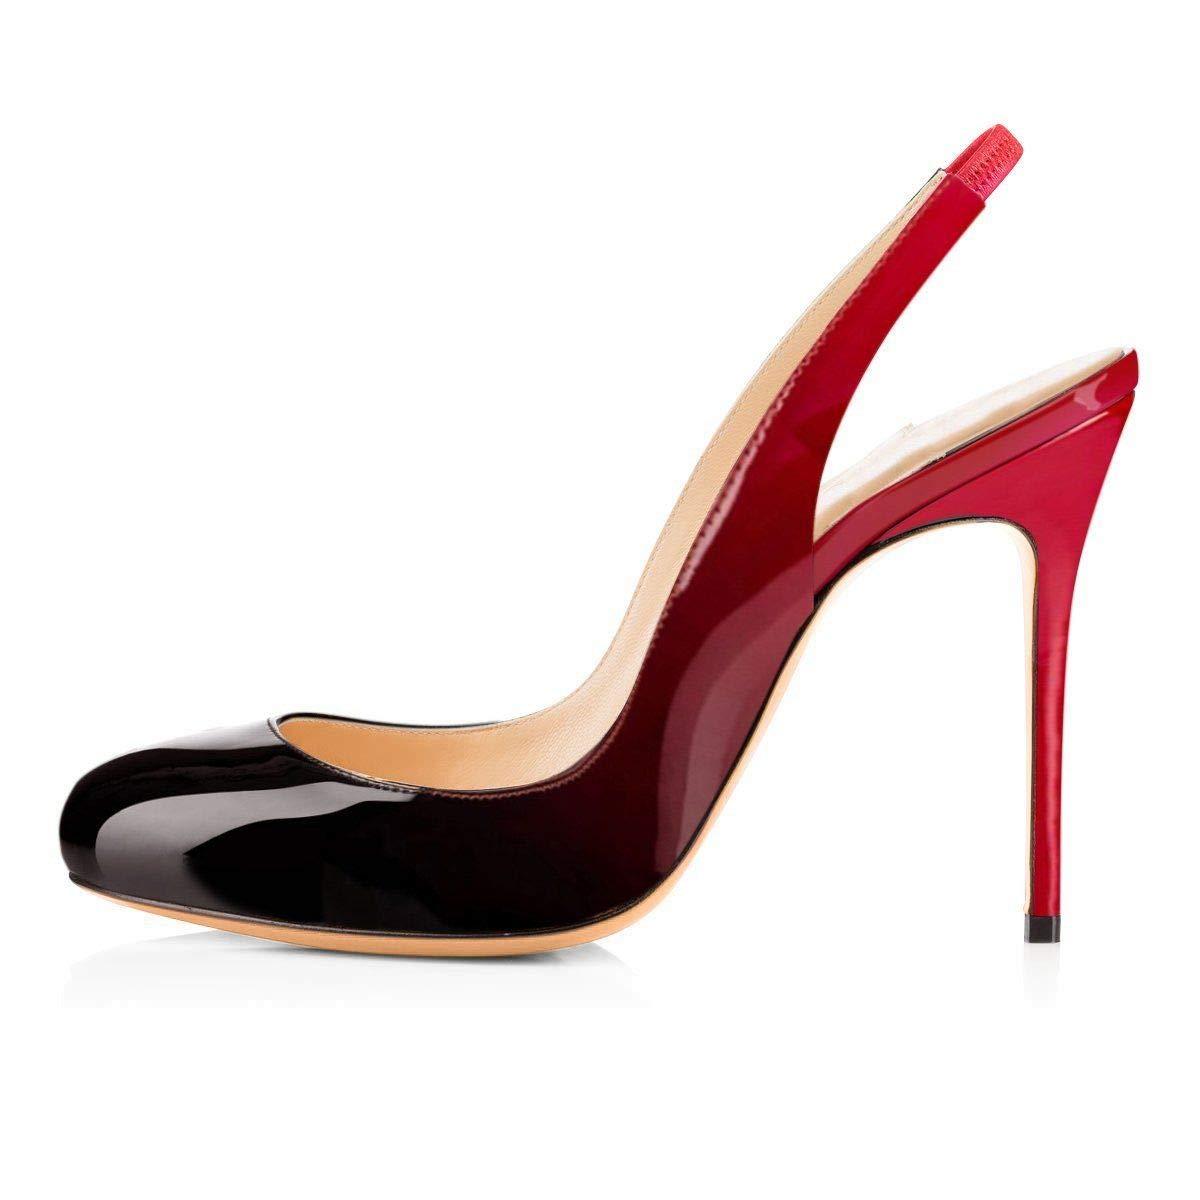 Black&Red Heels Addict's Women's shoes Round Toe Sling Back High Heel Sandals